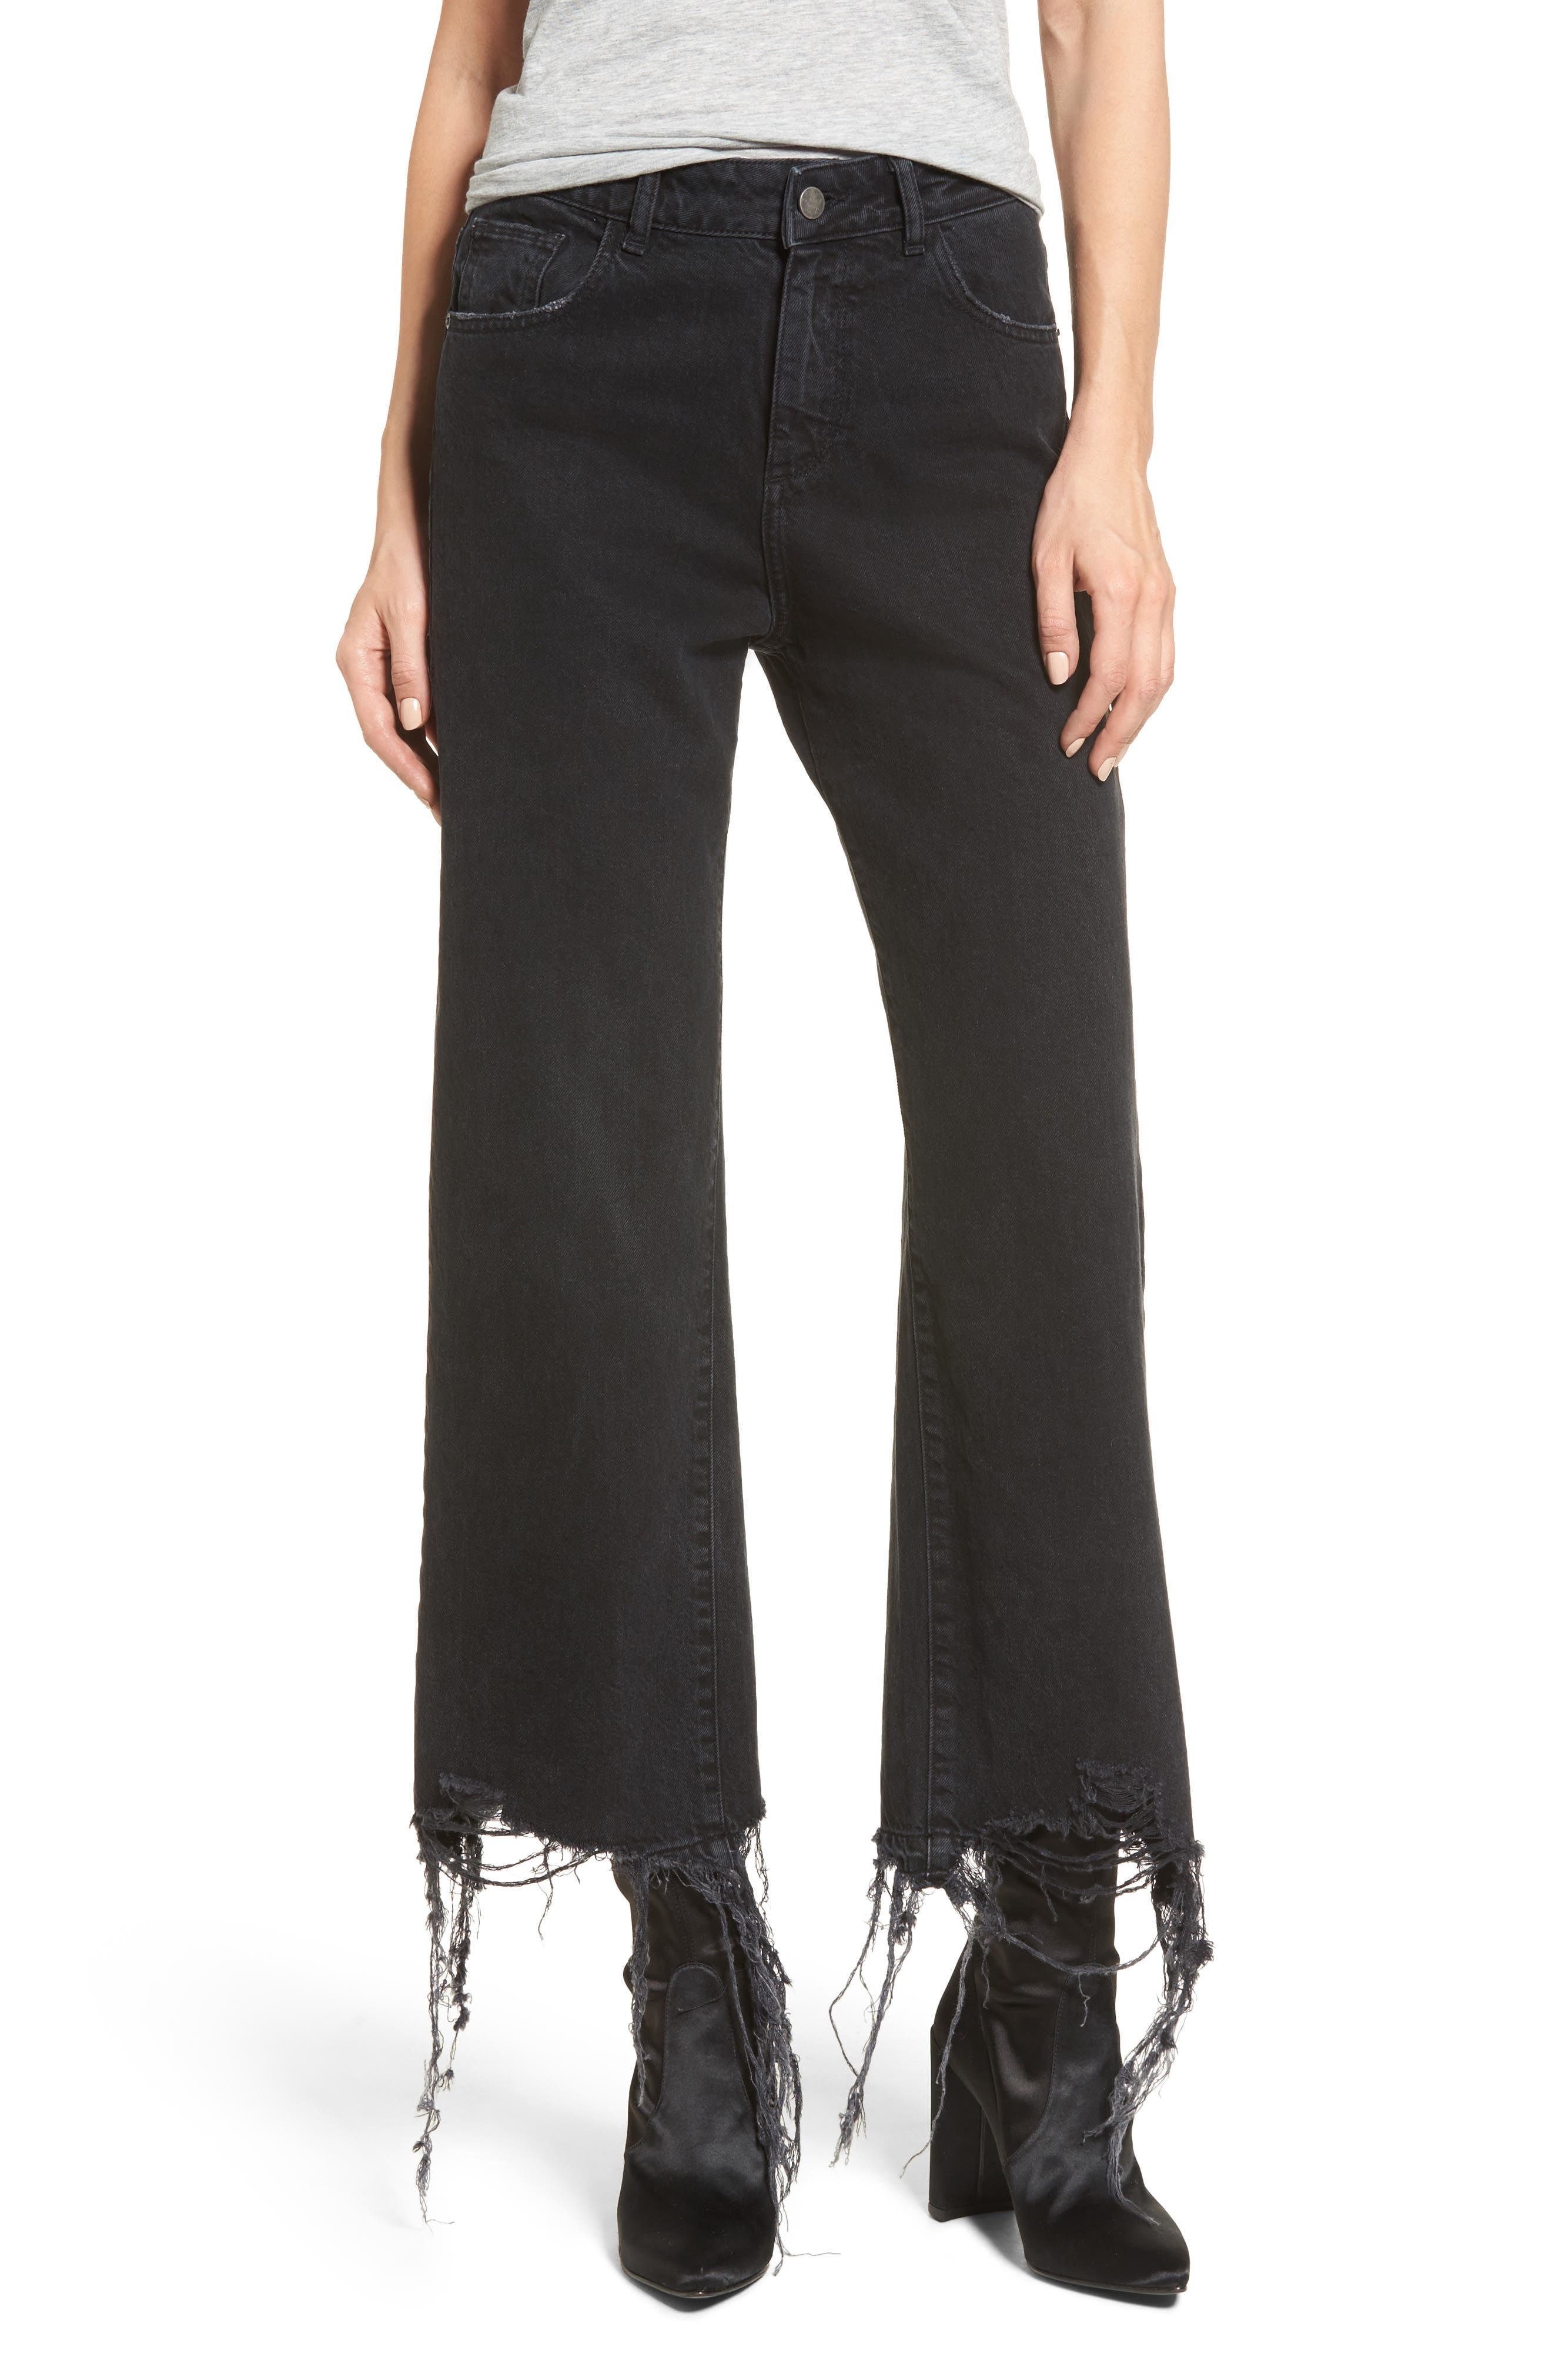 Hepburn High Waist Wide Leg Jeans,                             Main thumbnail 1, color,                             020